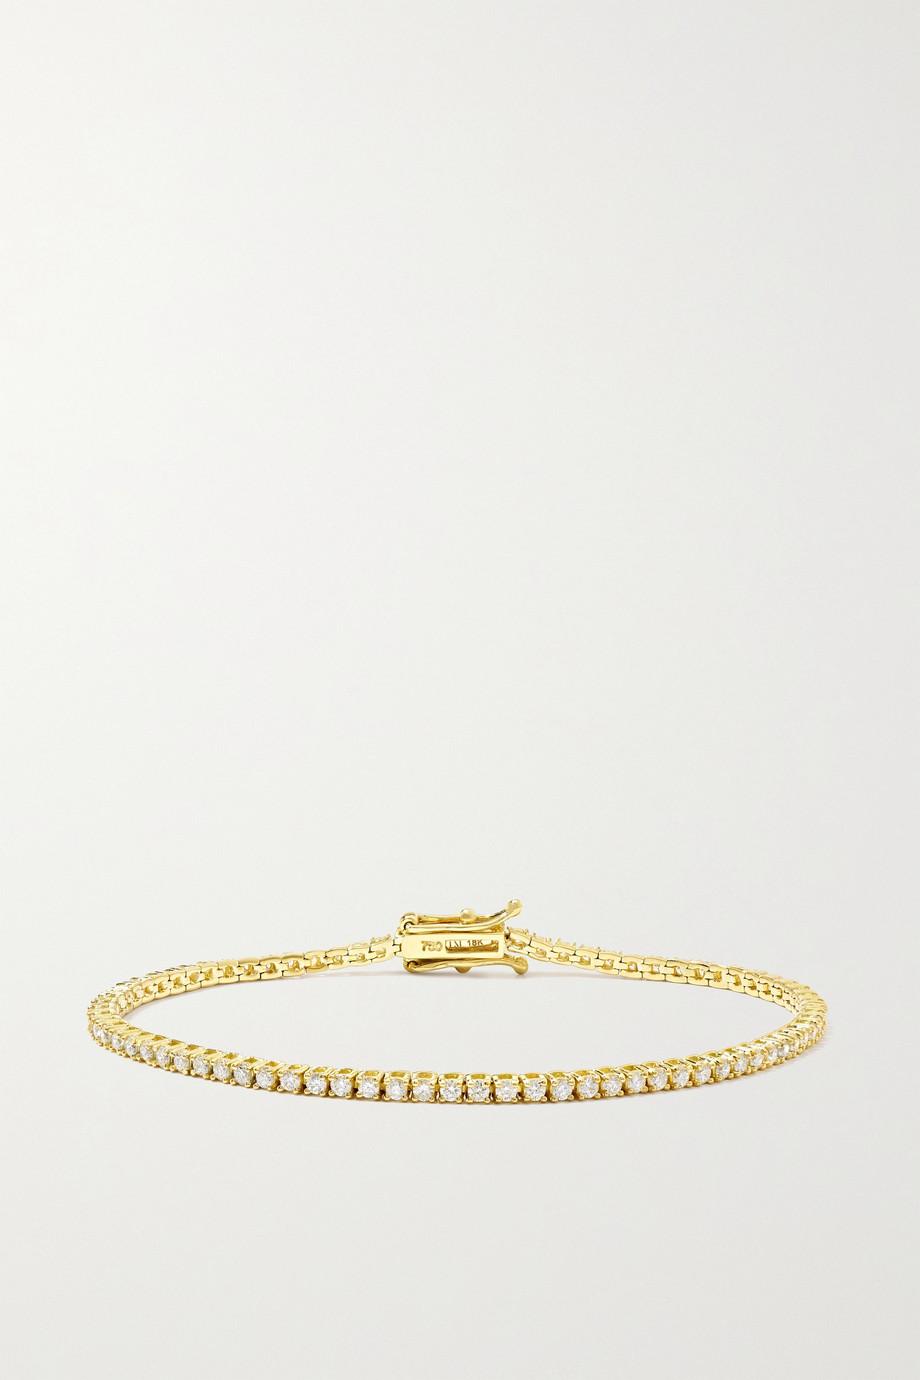 KATKIM Bracelet en or 18carats et diamants